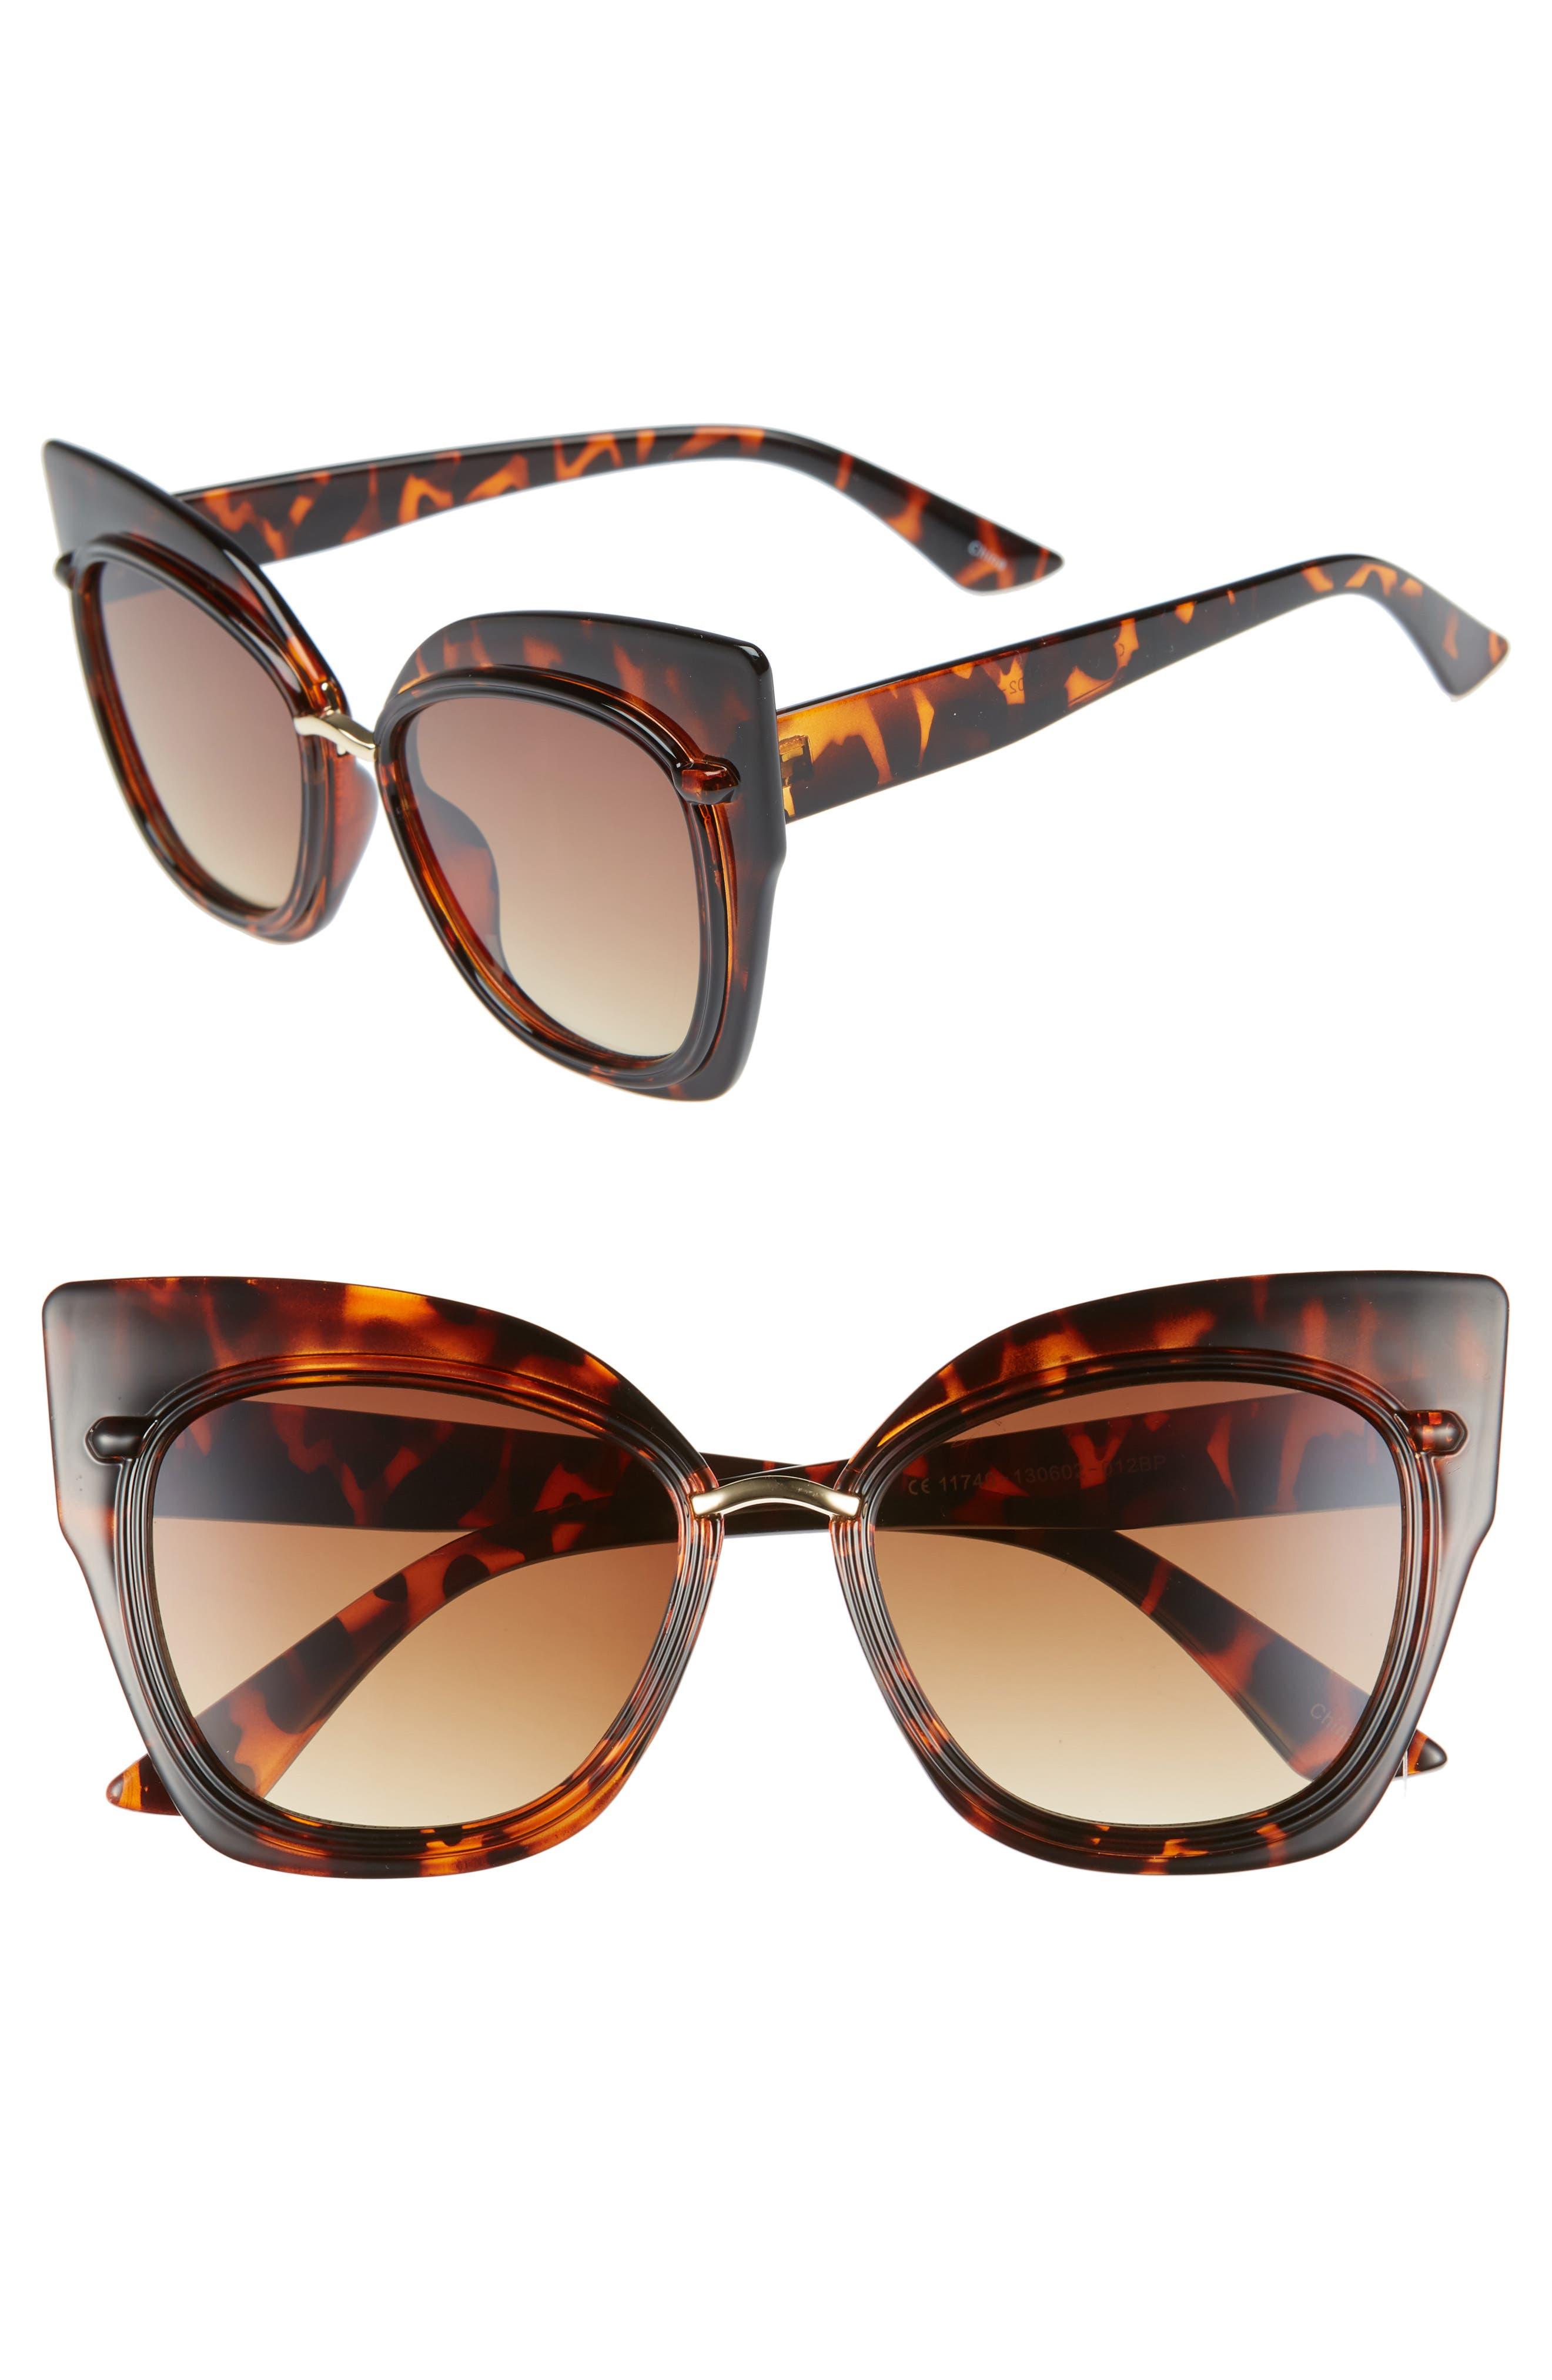 55mm Dual Oversized Cat Eye Sunglasses,                             Main thumbnail 1, color,                             200